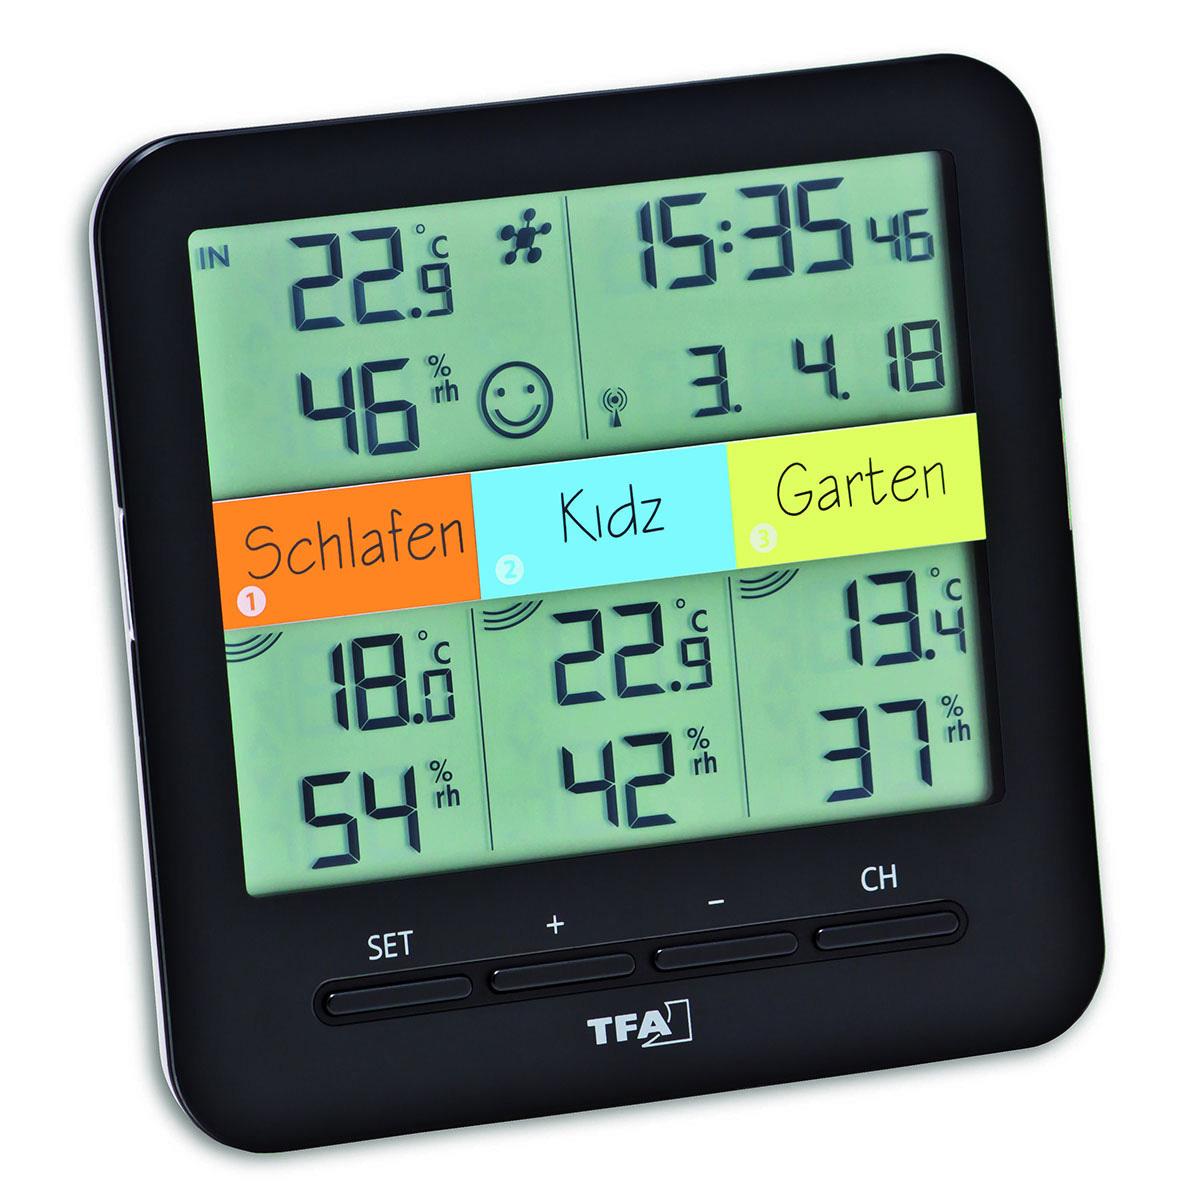 31-4007-02-starter-set-mit-klima@home-funk-thermo-hygrometer-weatherhub-station-1200x1200px.jpg